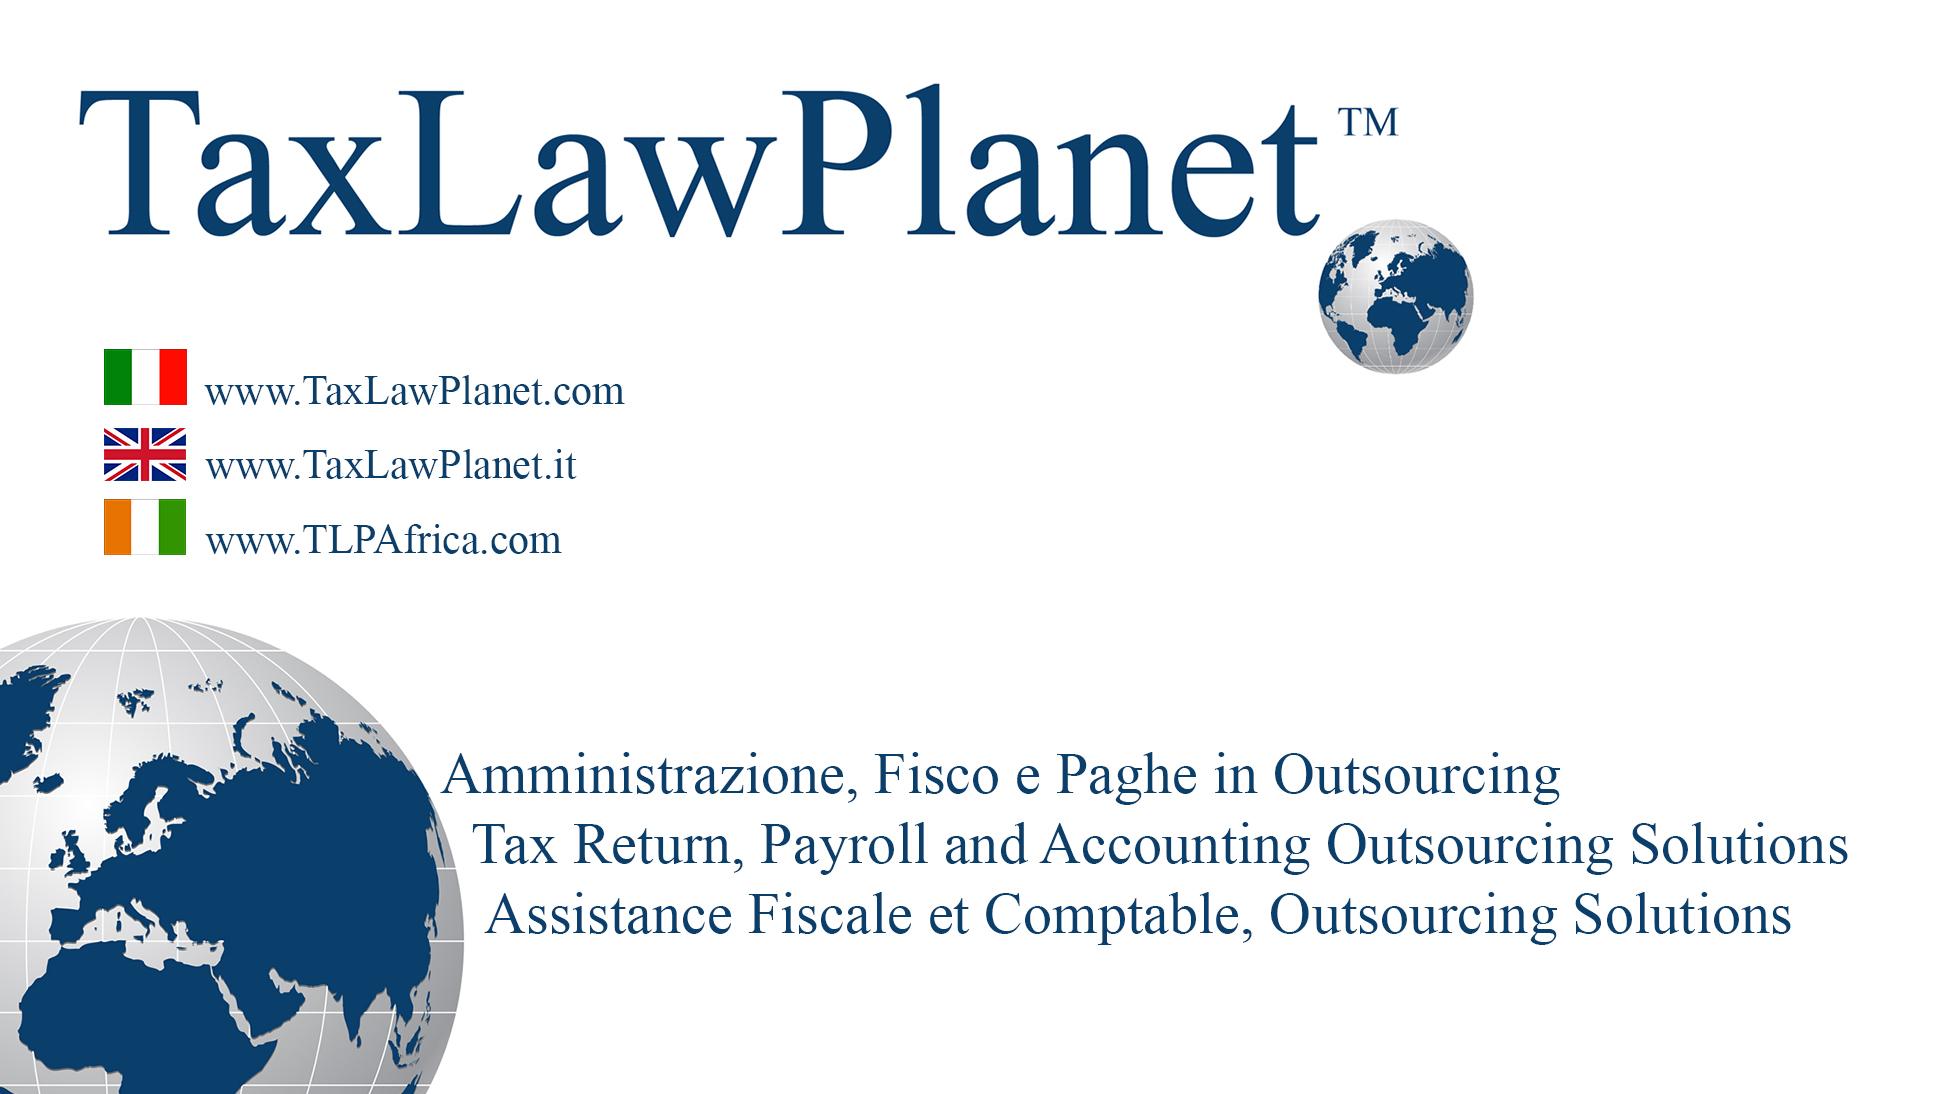 Taxlawplanet Srl